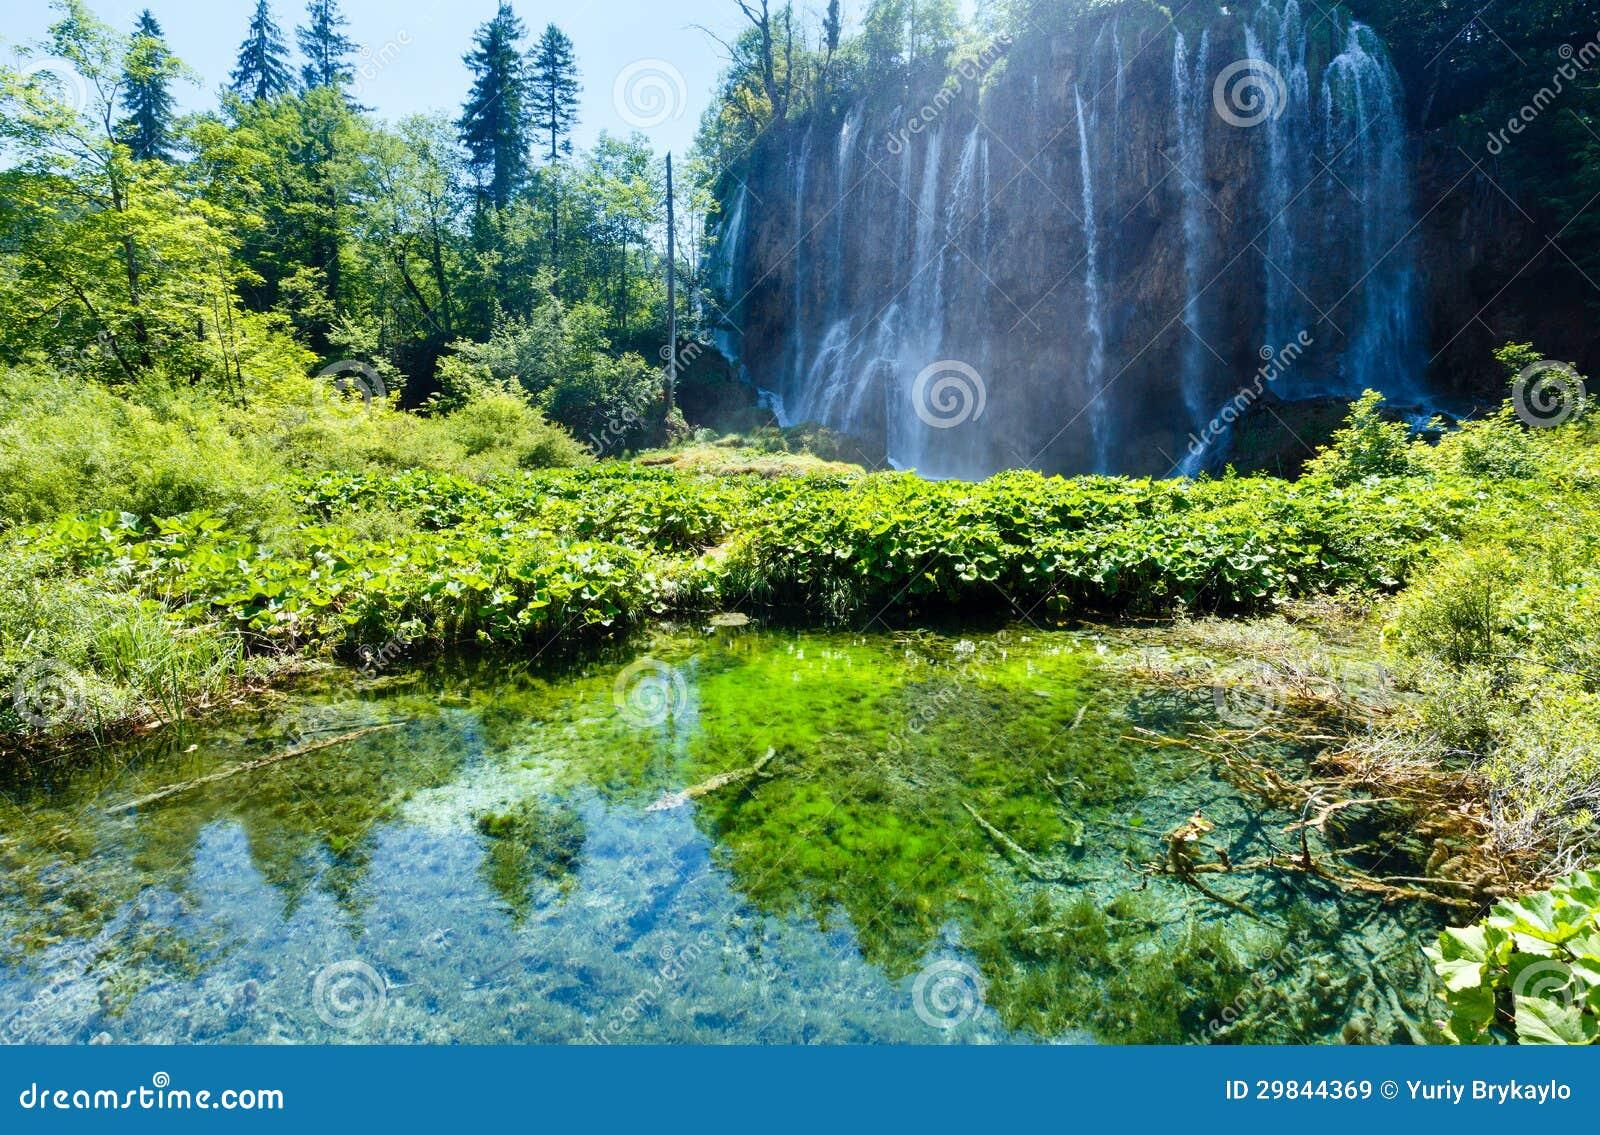 Parque nacional dos lagos Plitvice (Croatia)